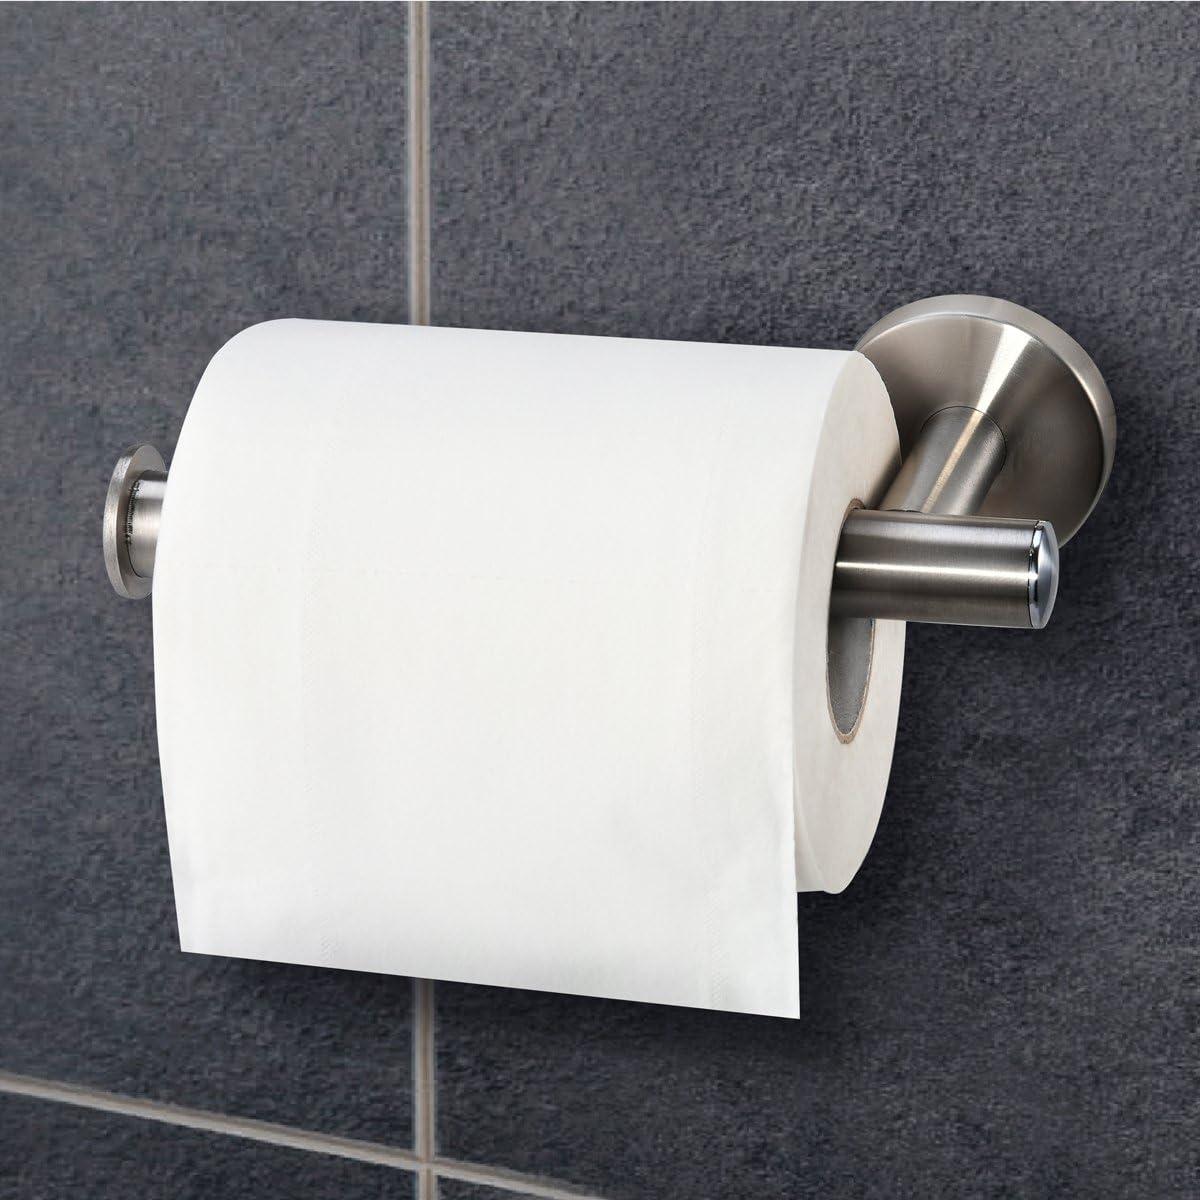 Amazon Com Dailyart Toilet Paper Holder Stainless Steel Bathroom Tissue Holder Toilet Paper Dispenser Wall Mount Screw Mounting Home Kitchen